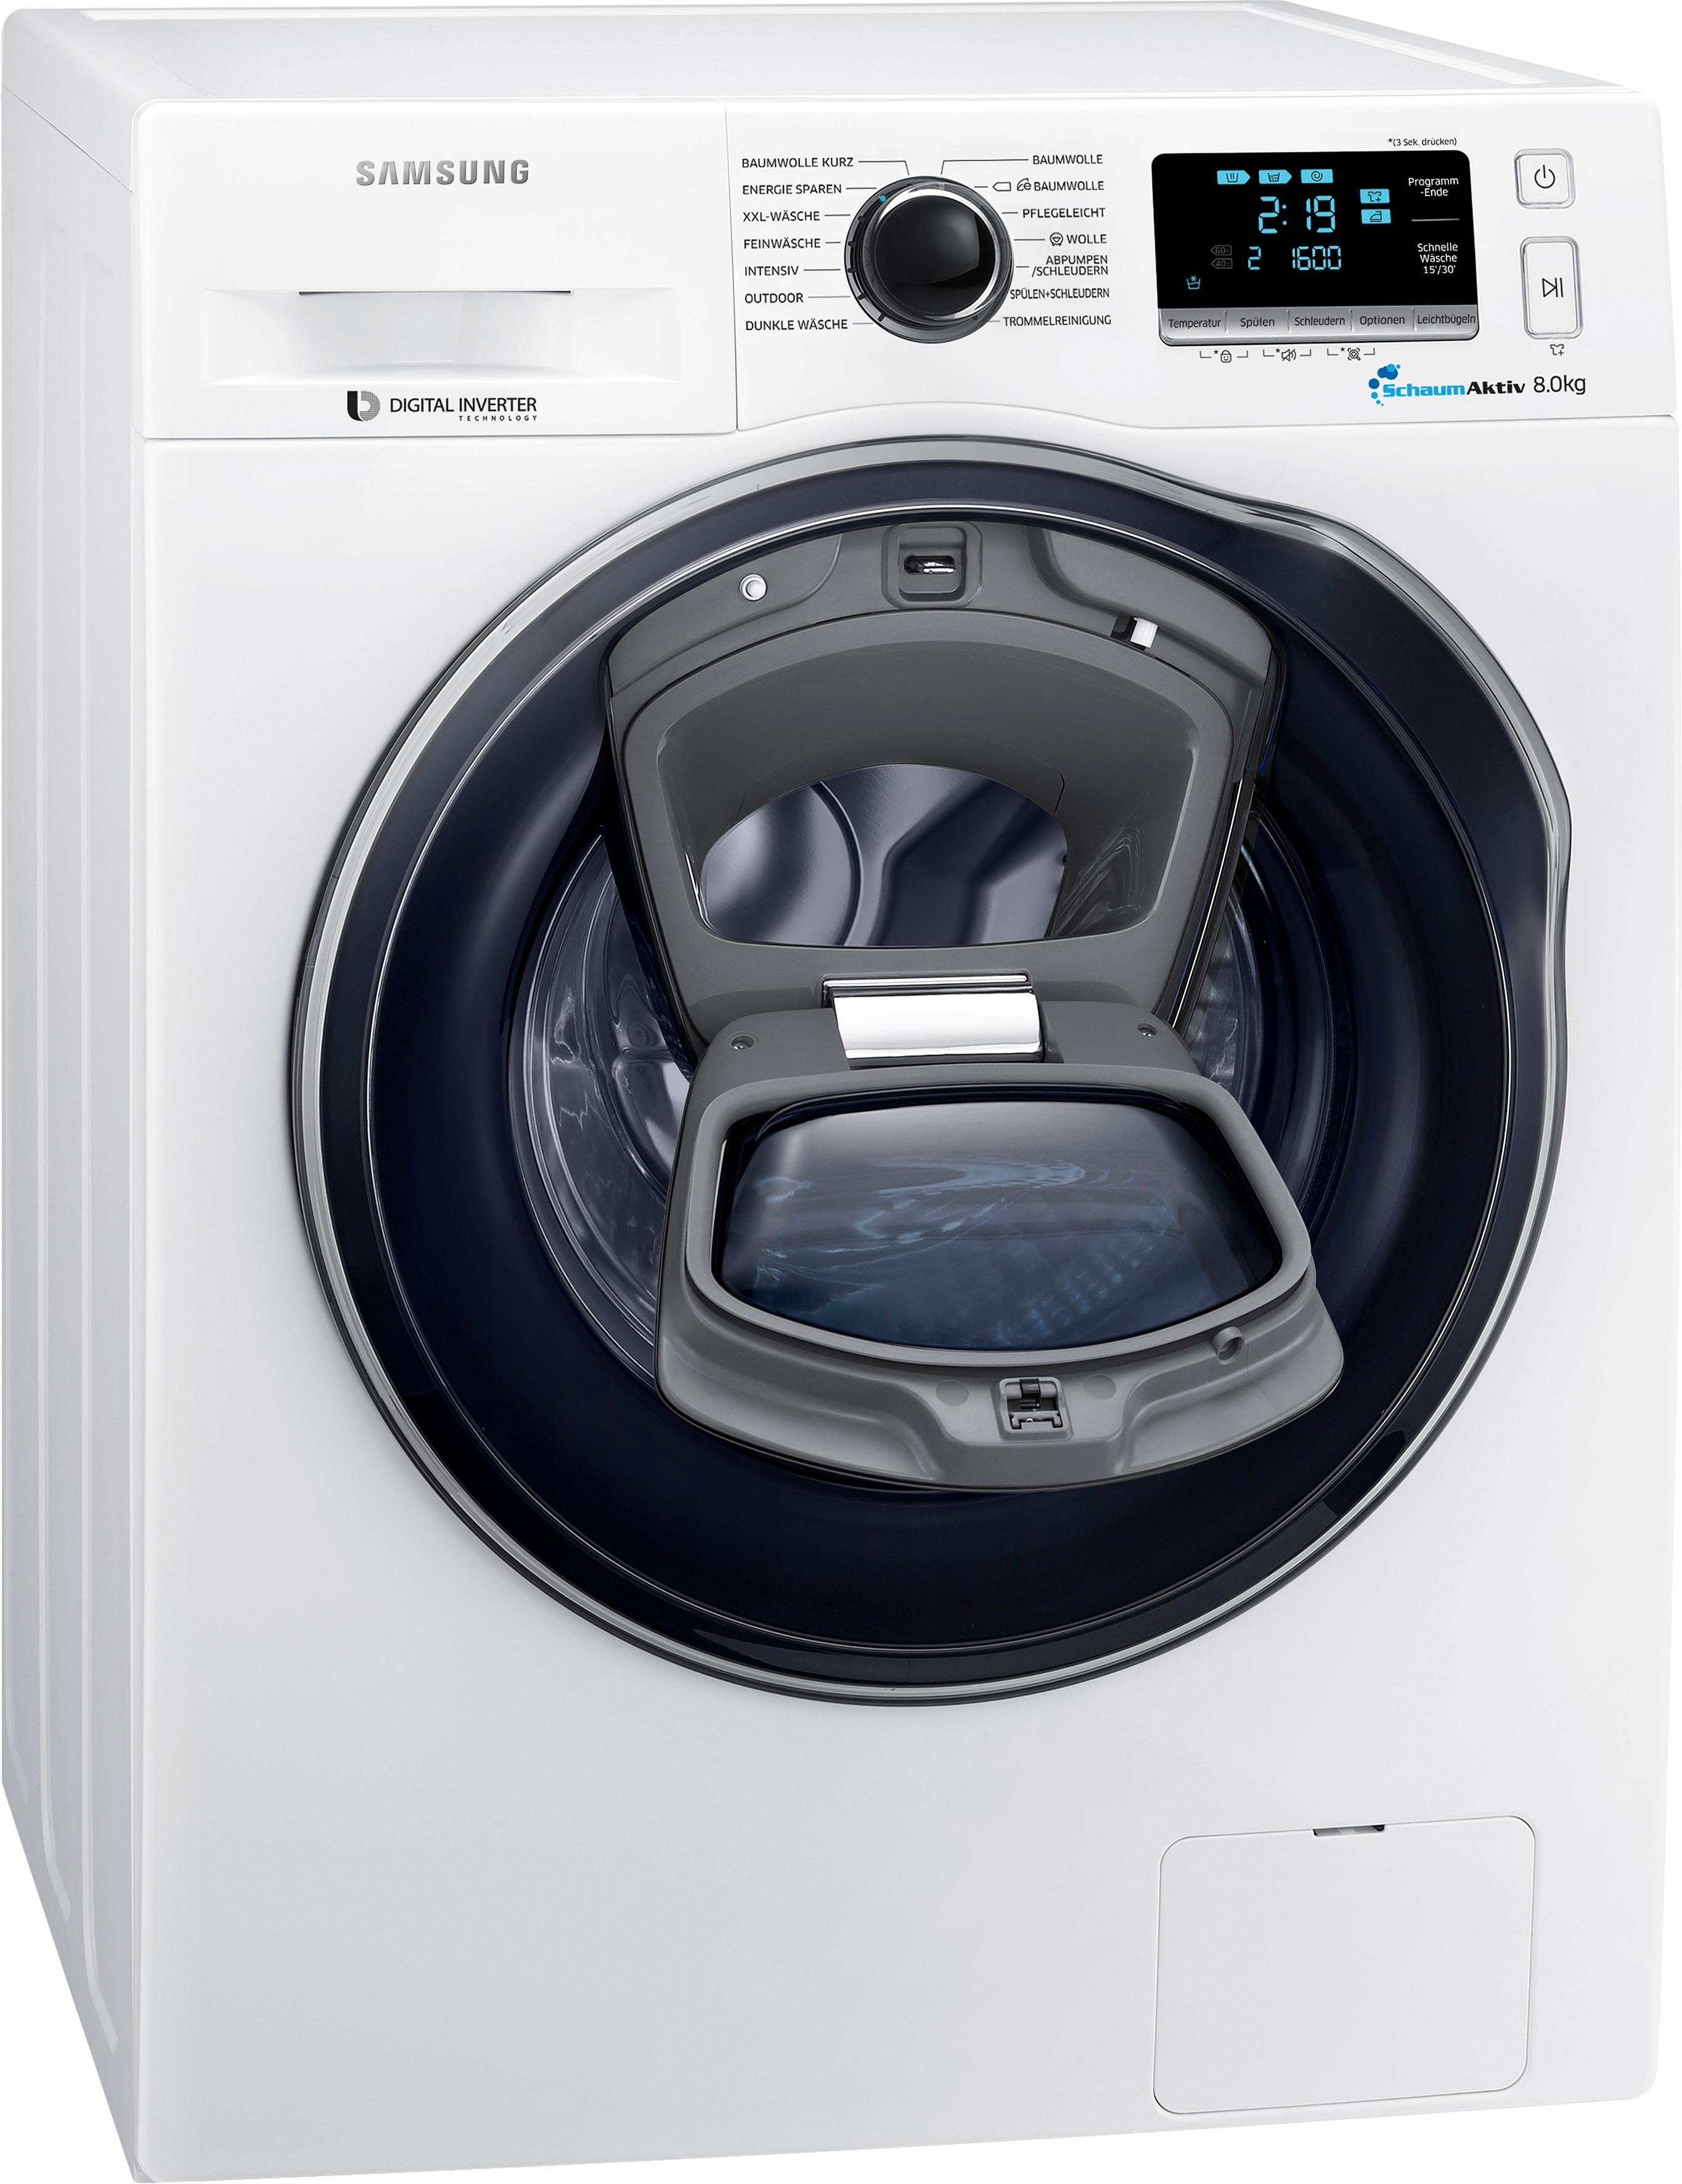 Samsung Waschmaschine WW8GK6400QW/EG, 8 kg, 1400 U/Min